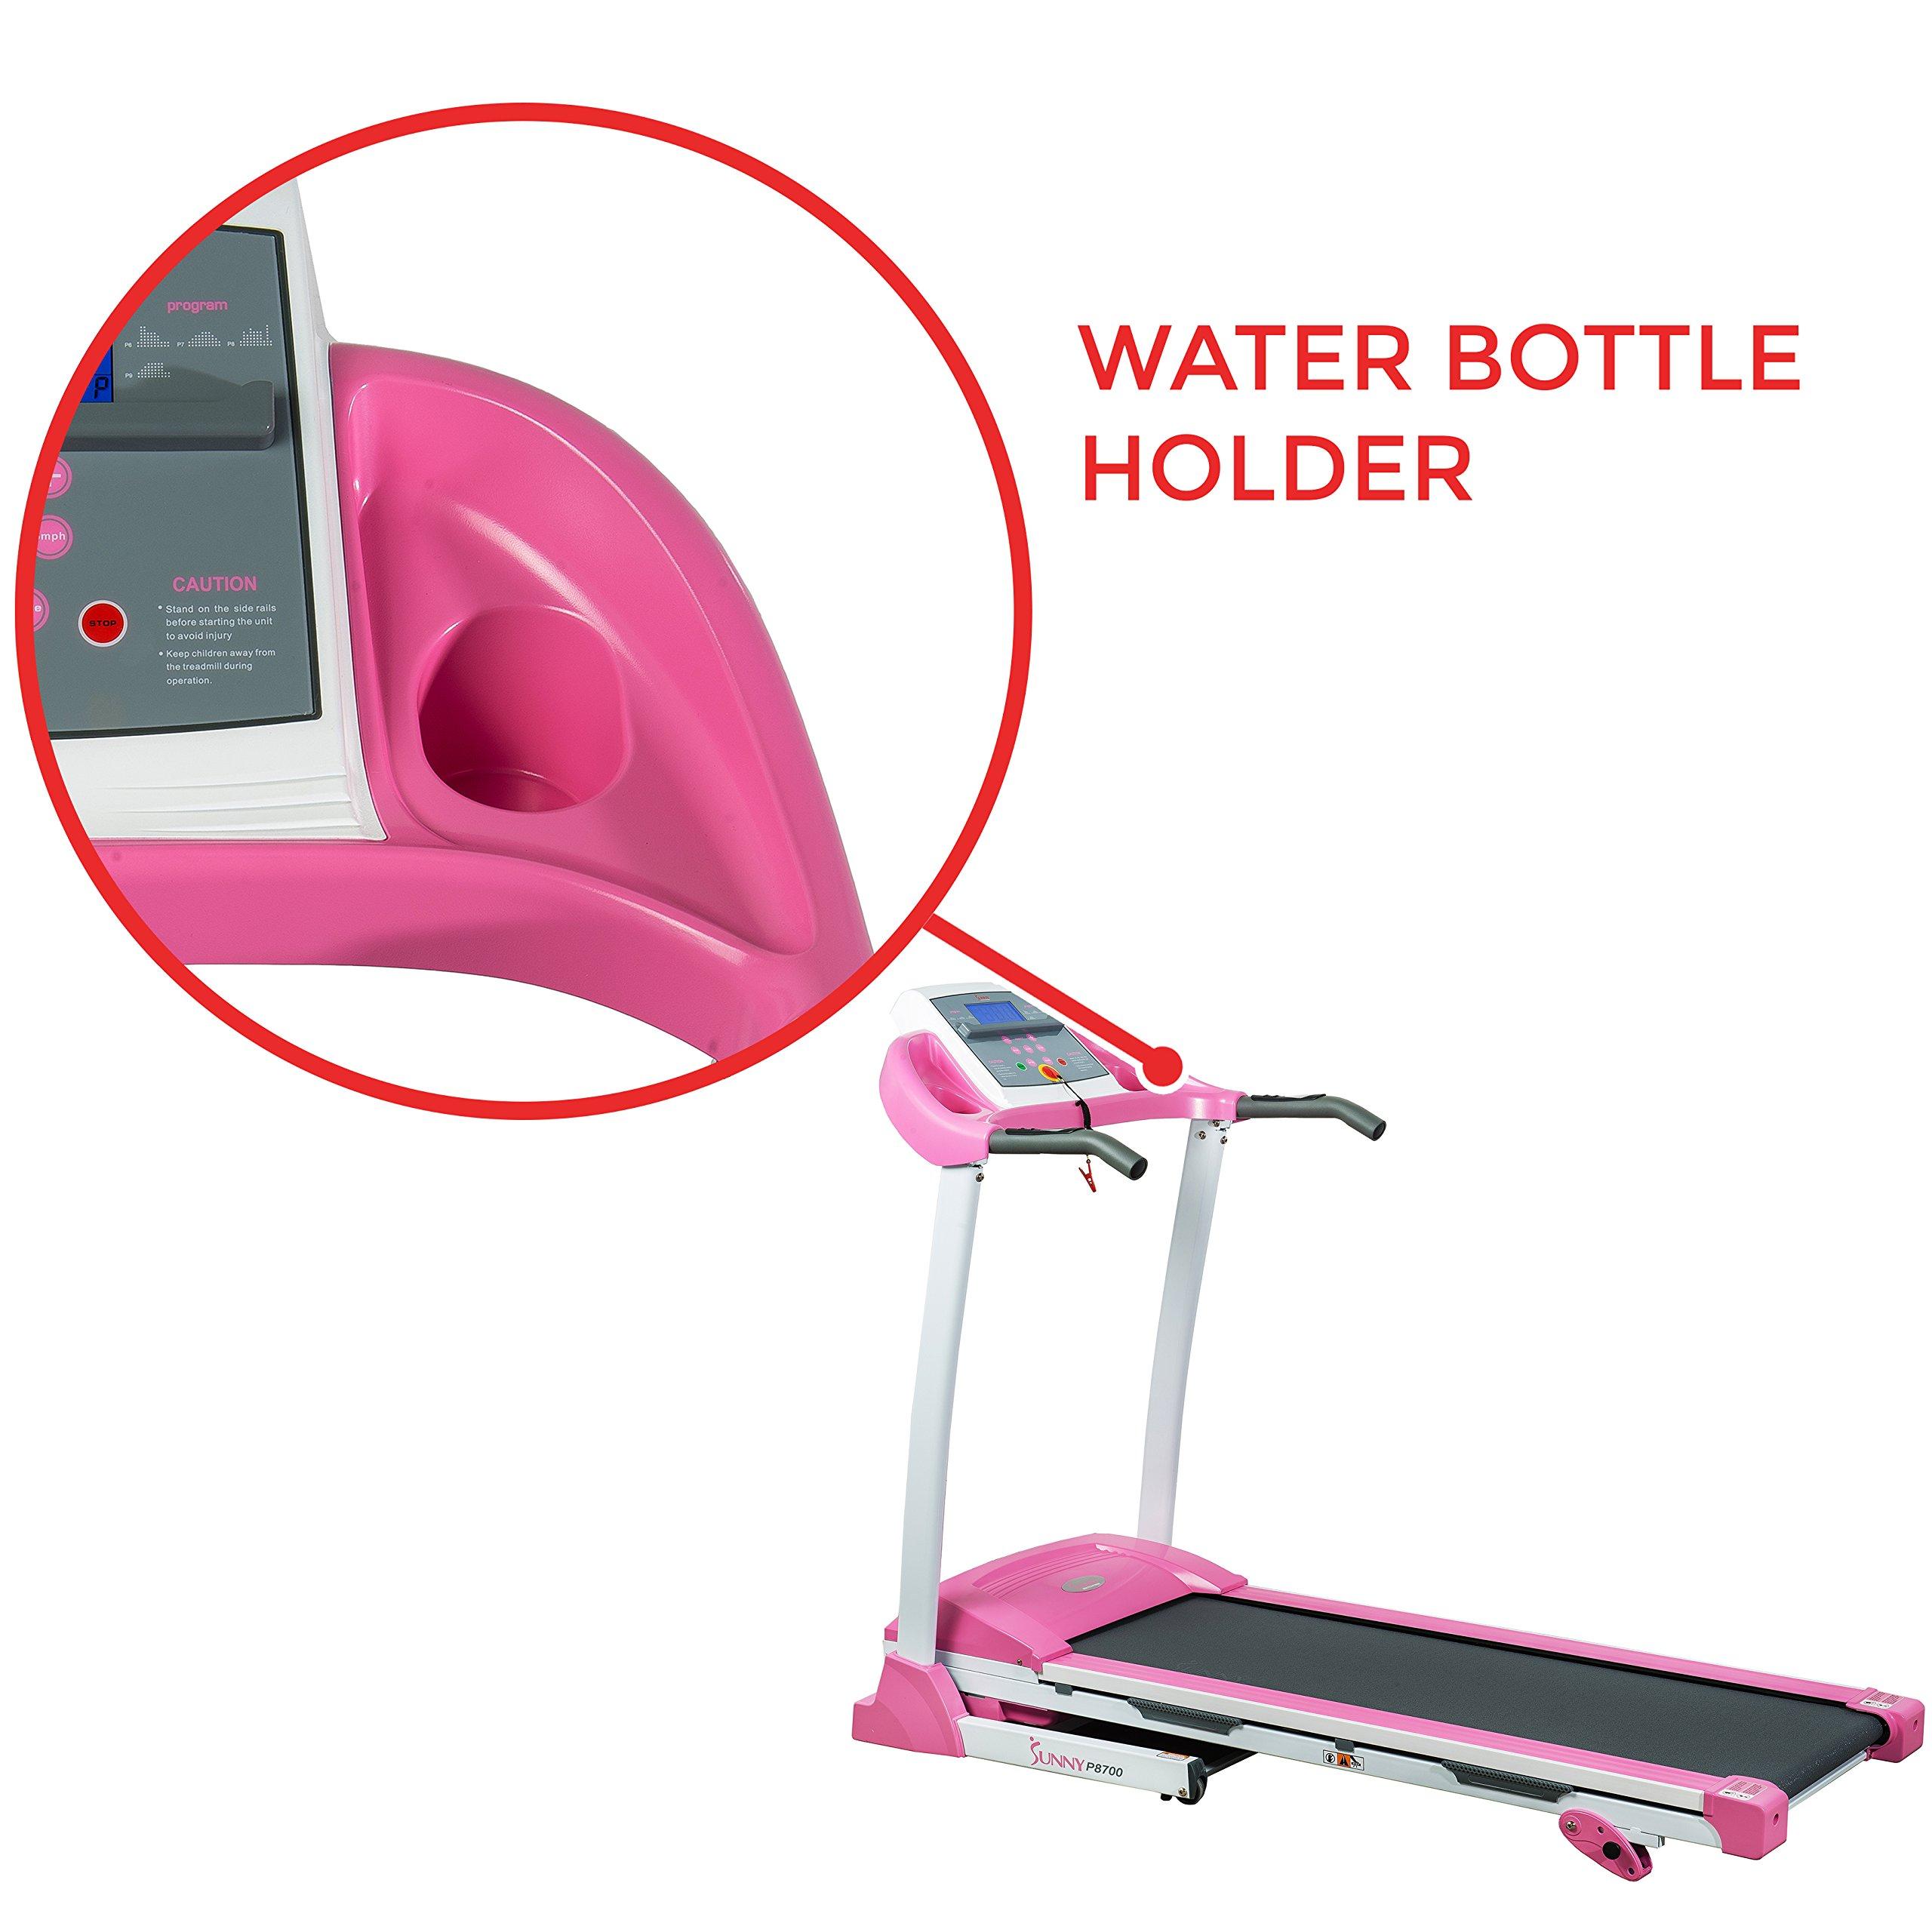 Sunny Health & Fitness P8700 Pink Treadmill by Sunny Health & Fitness (Image #7)